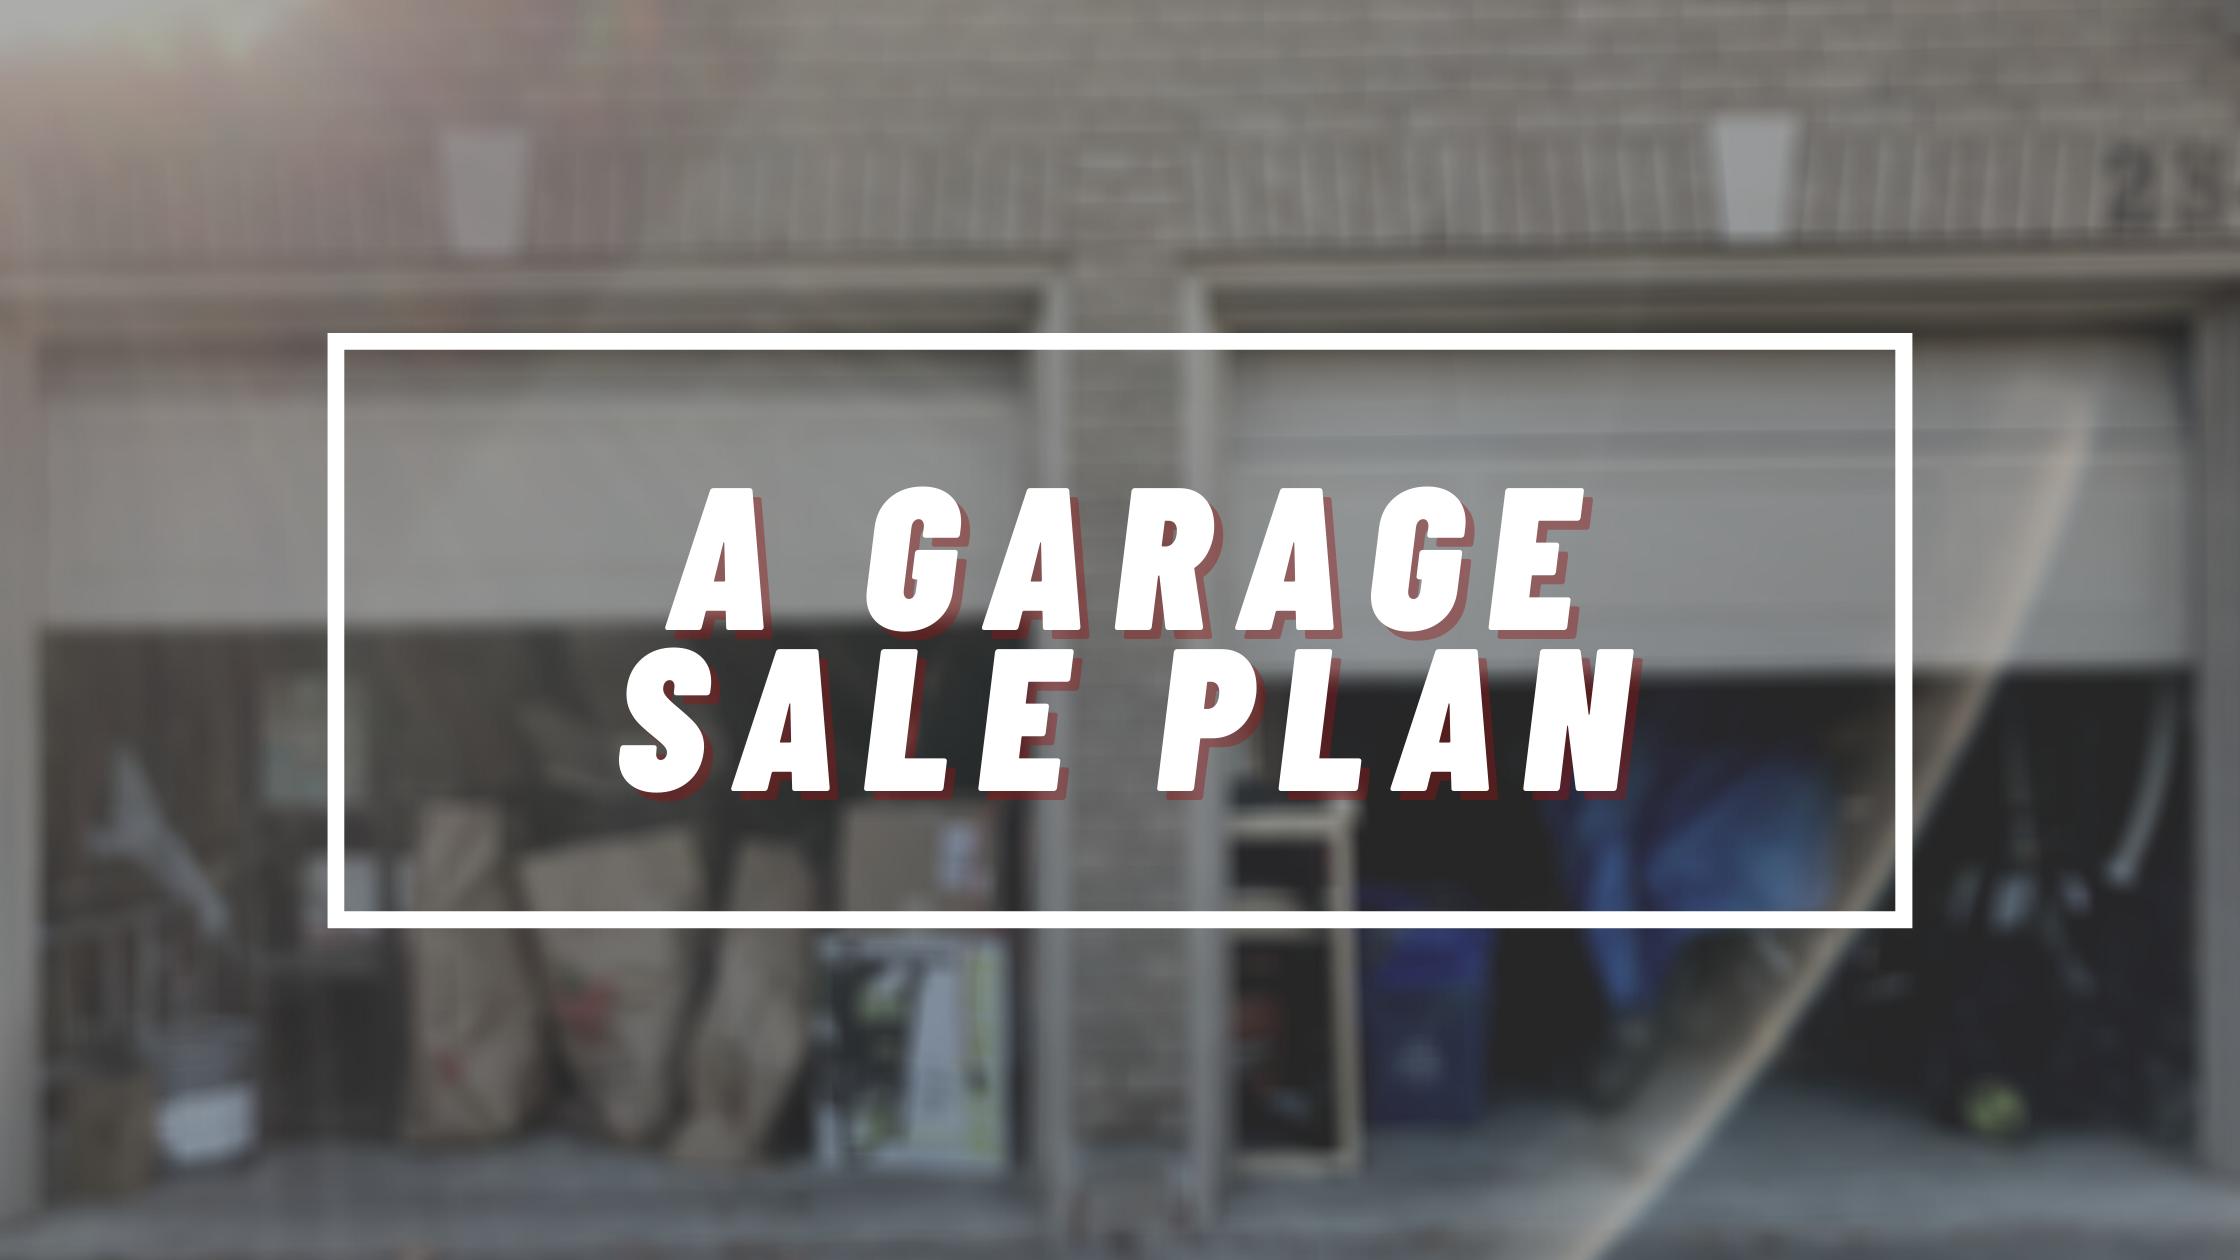 A Garage Sale Plan by Bin There Dump That